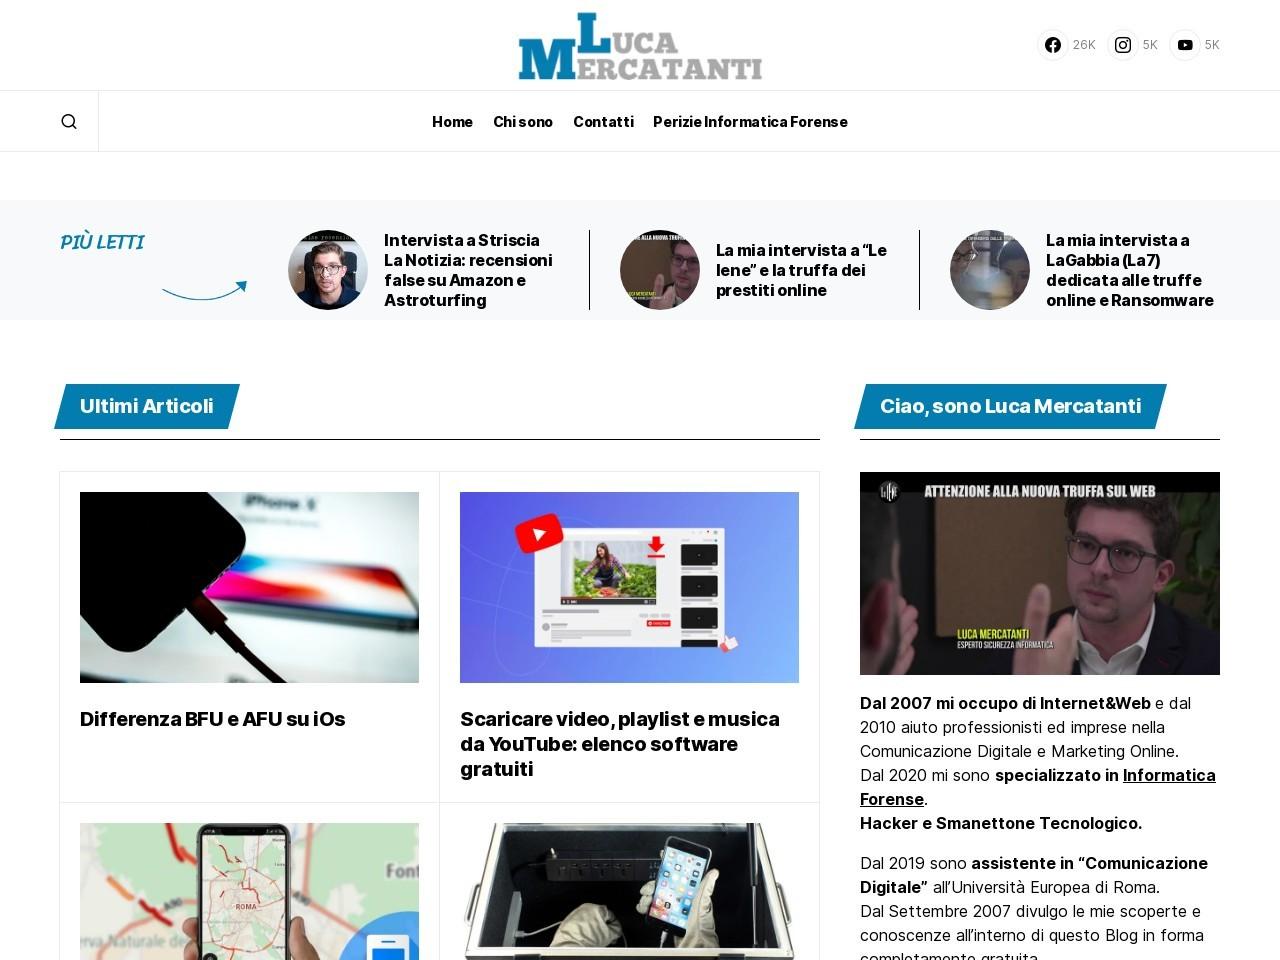 luca-mercatantis-blog